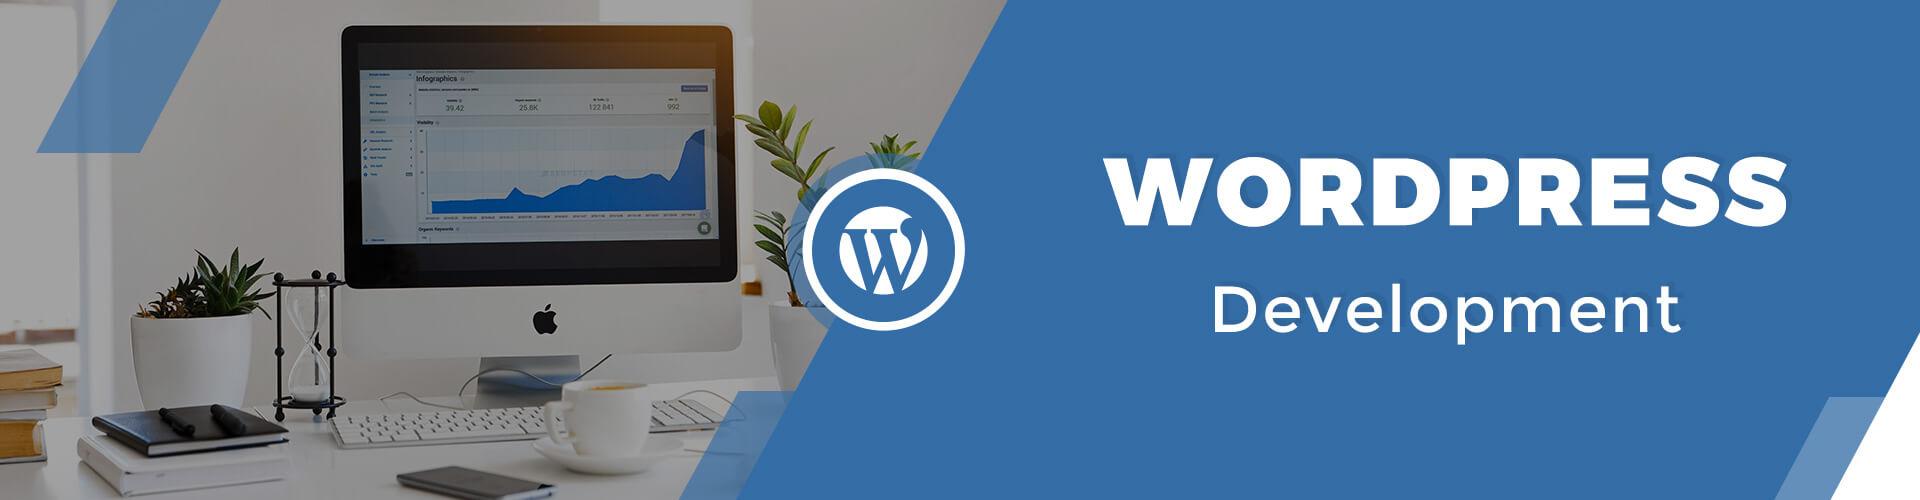 Best Web WordPress Plugin Theme Design Development Company Services Mint Media